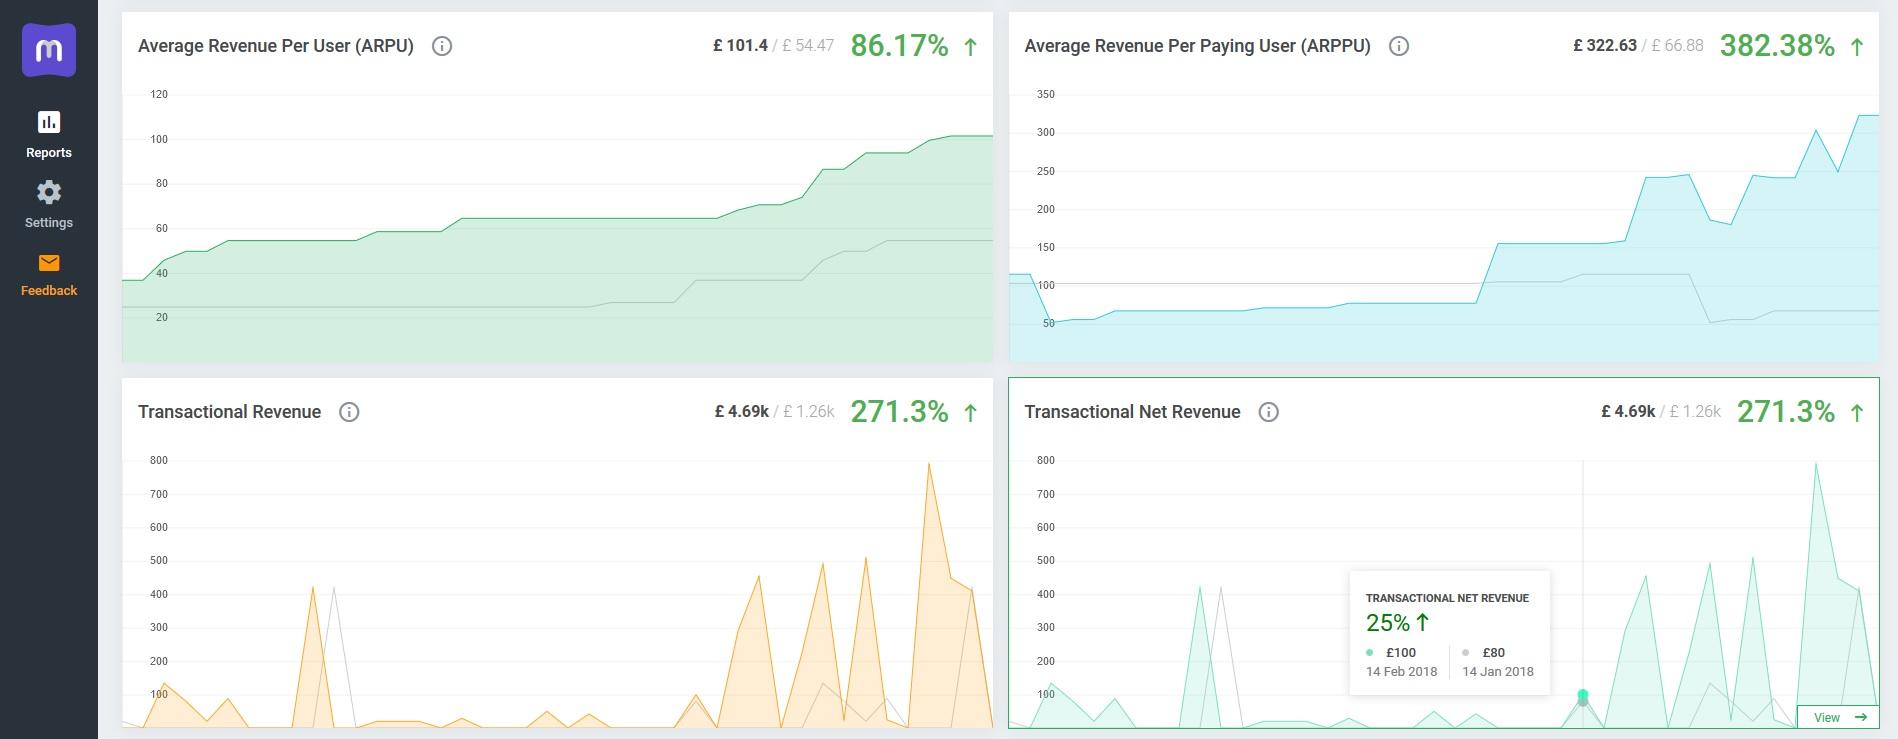 New Billing Reports: ARPU, ARPPU, Transactional Revenue, Transactional Net Revenue - MetricsCube